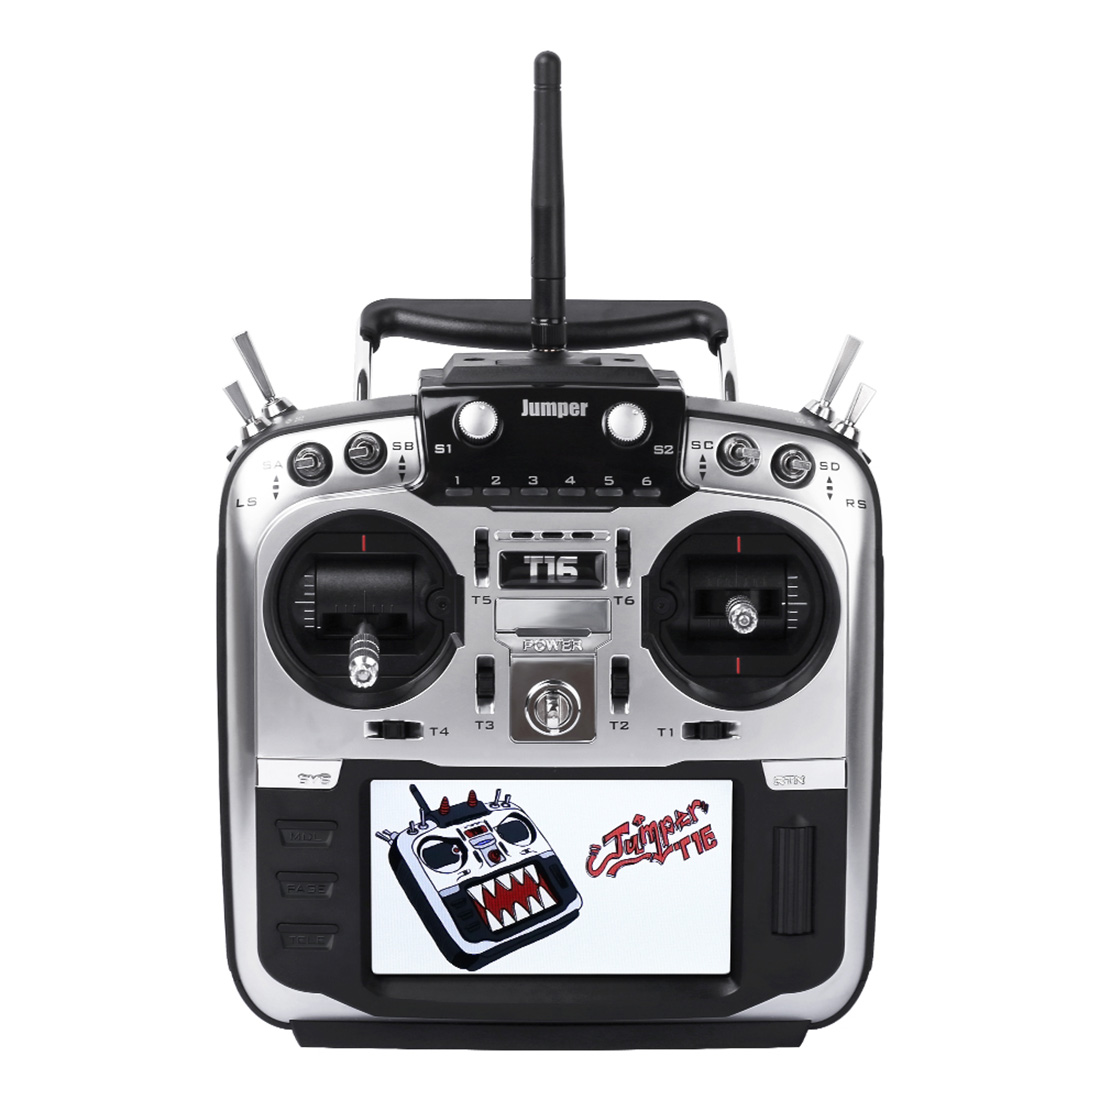 Jumper-XYZ T16 Pro Hall Gimbal Open Source Multi-protocol Radio Transmitter JP4-in-1 RF Module 2.4G 16CH 4.3